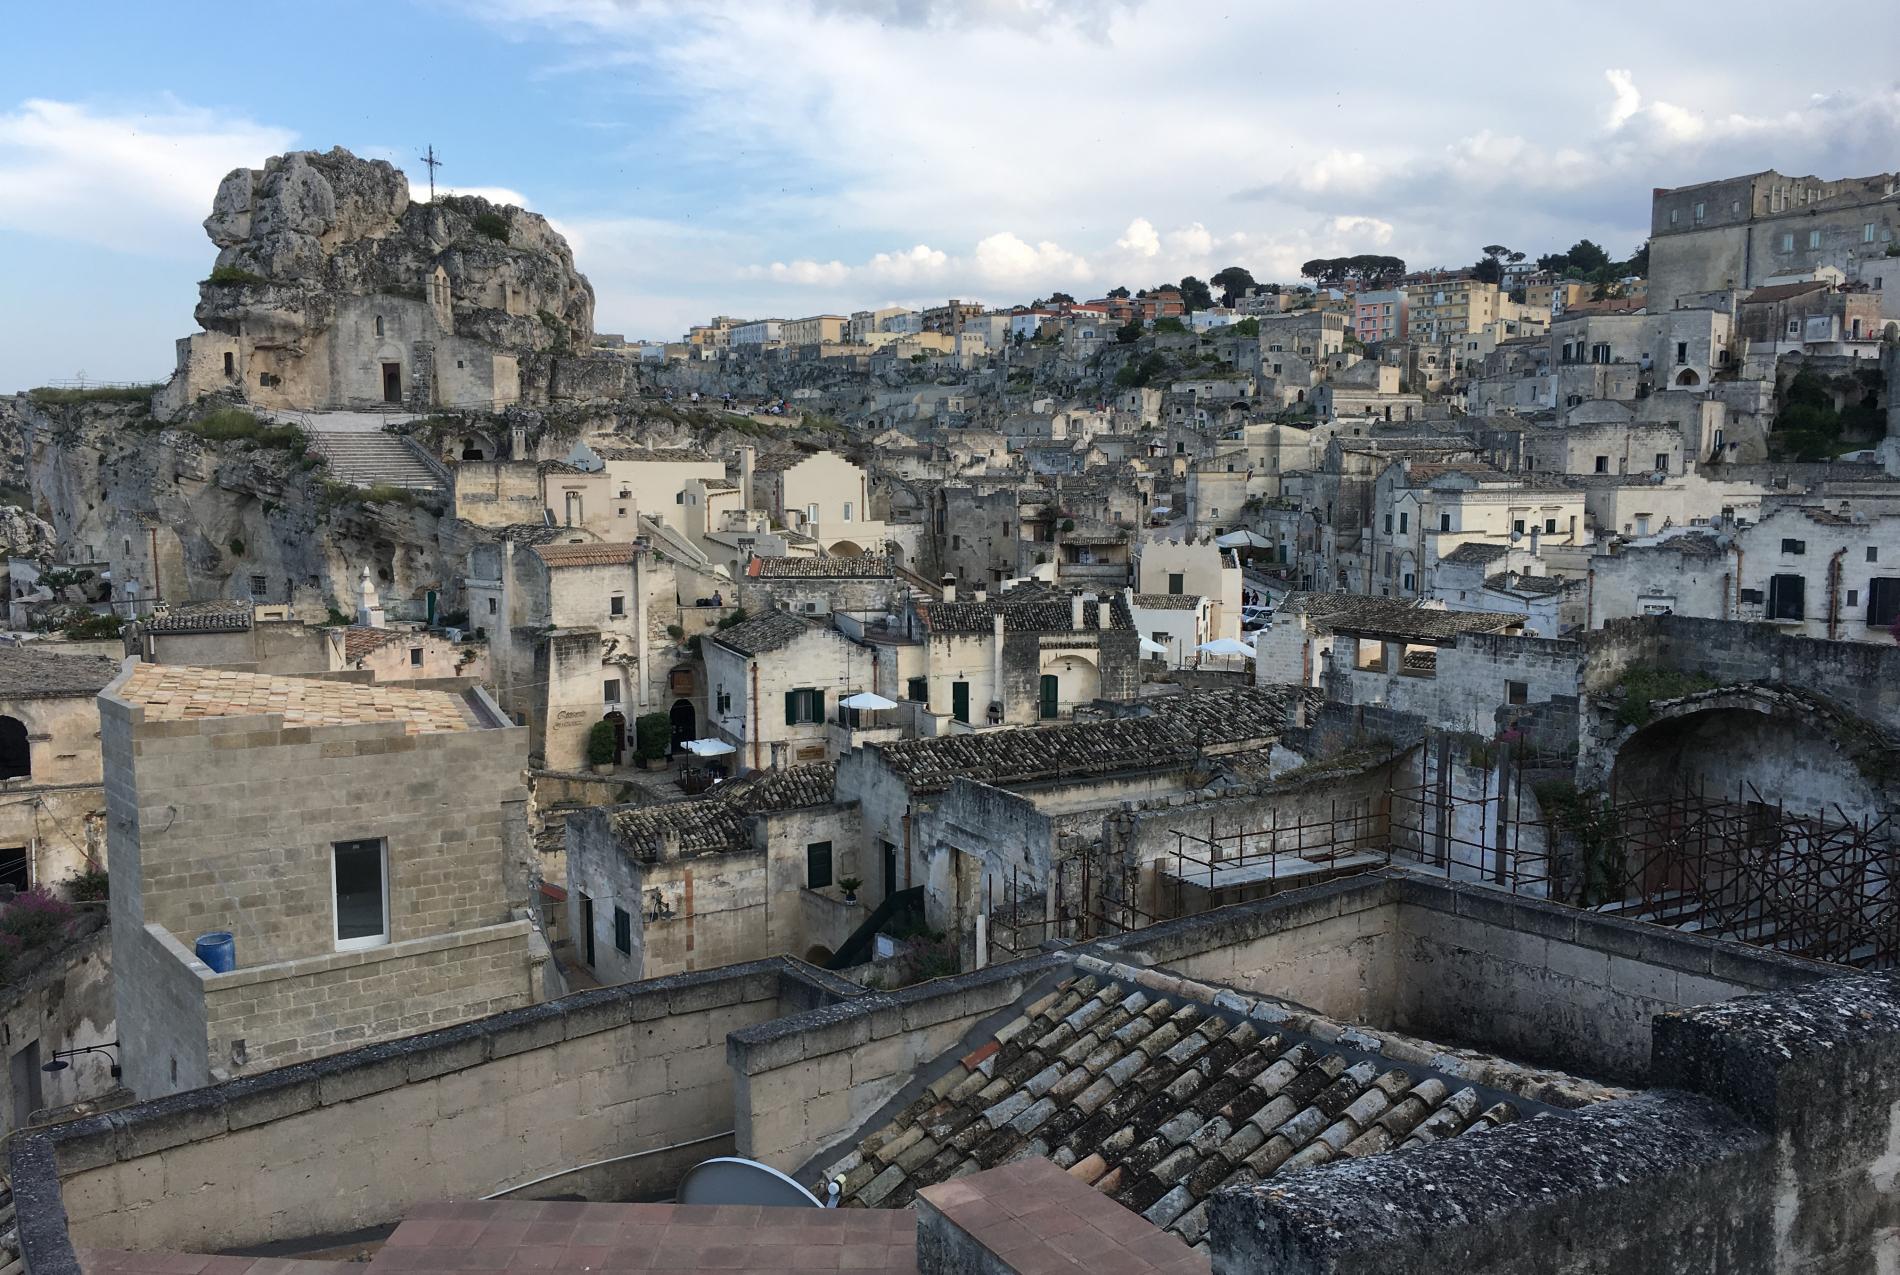 Voyage solidaire Italie : Vision du Monde - Photo 11